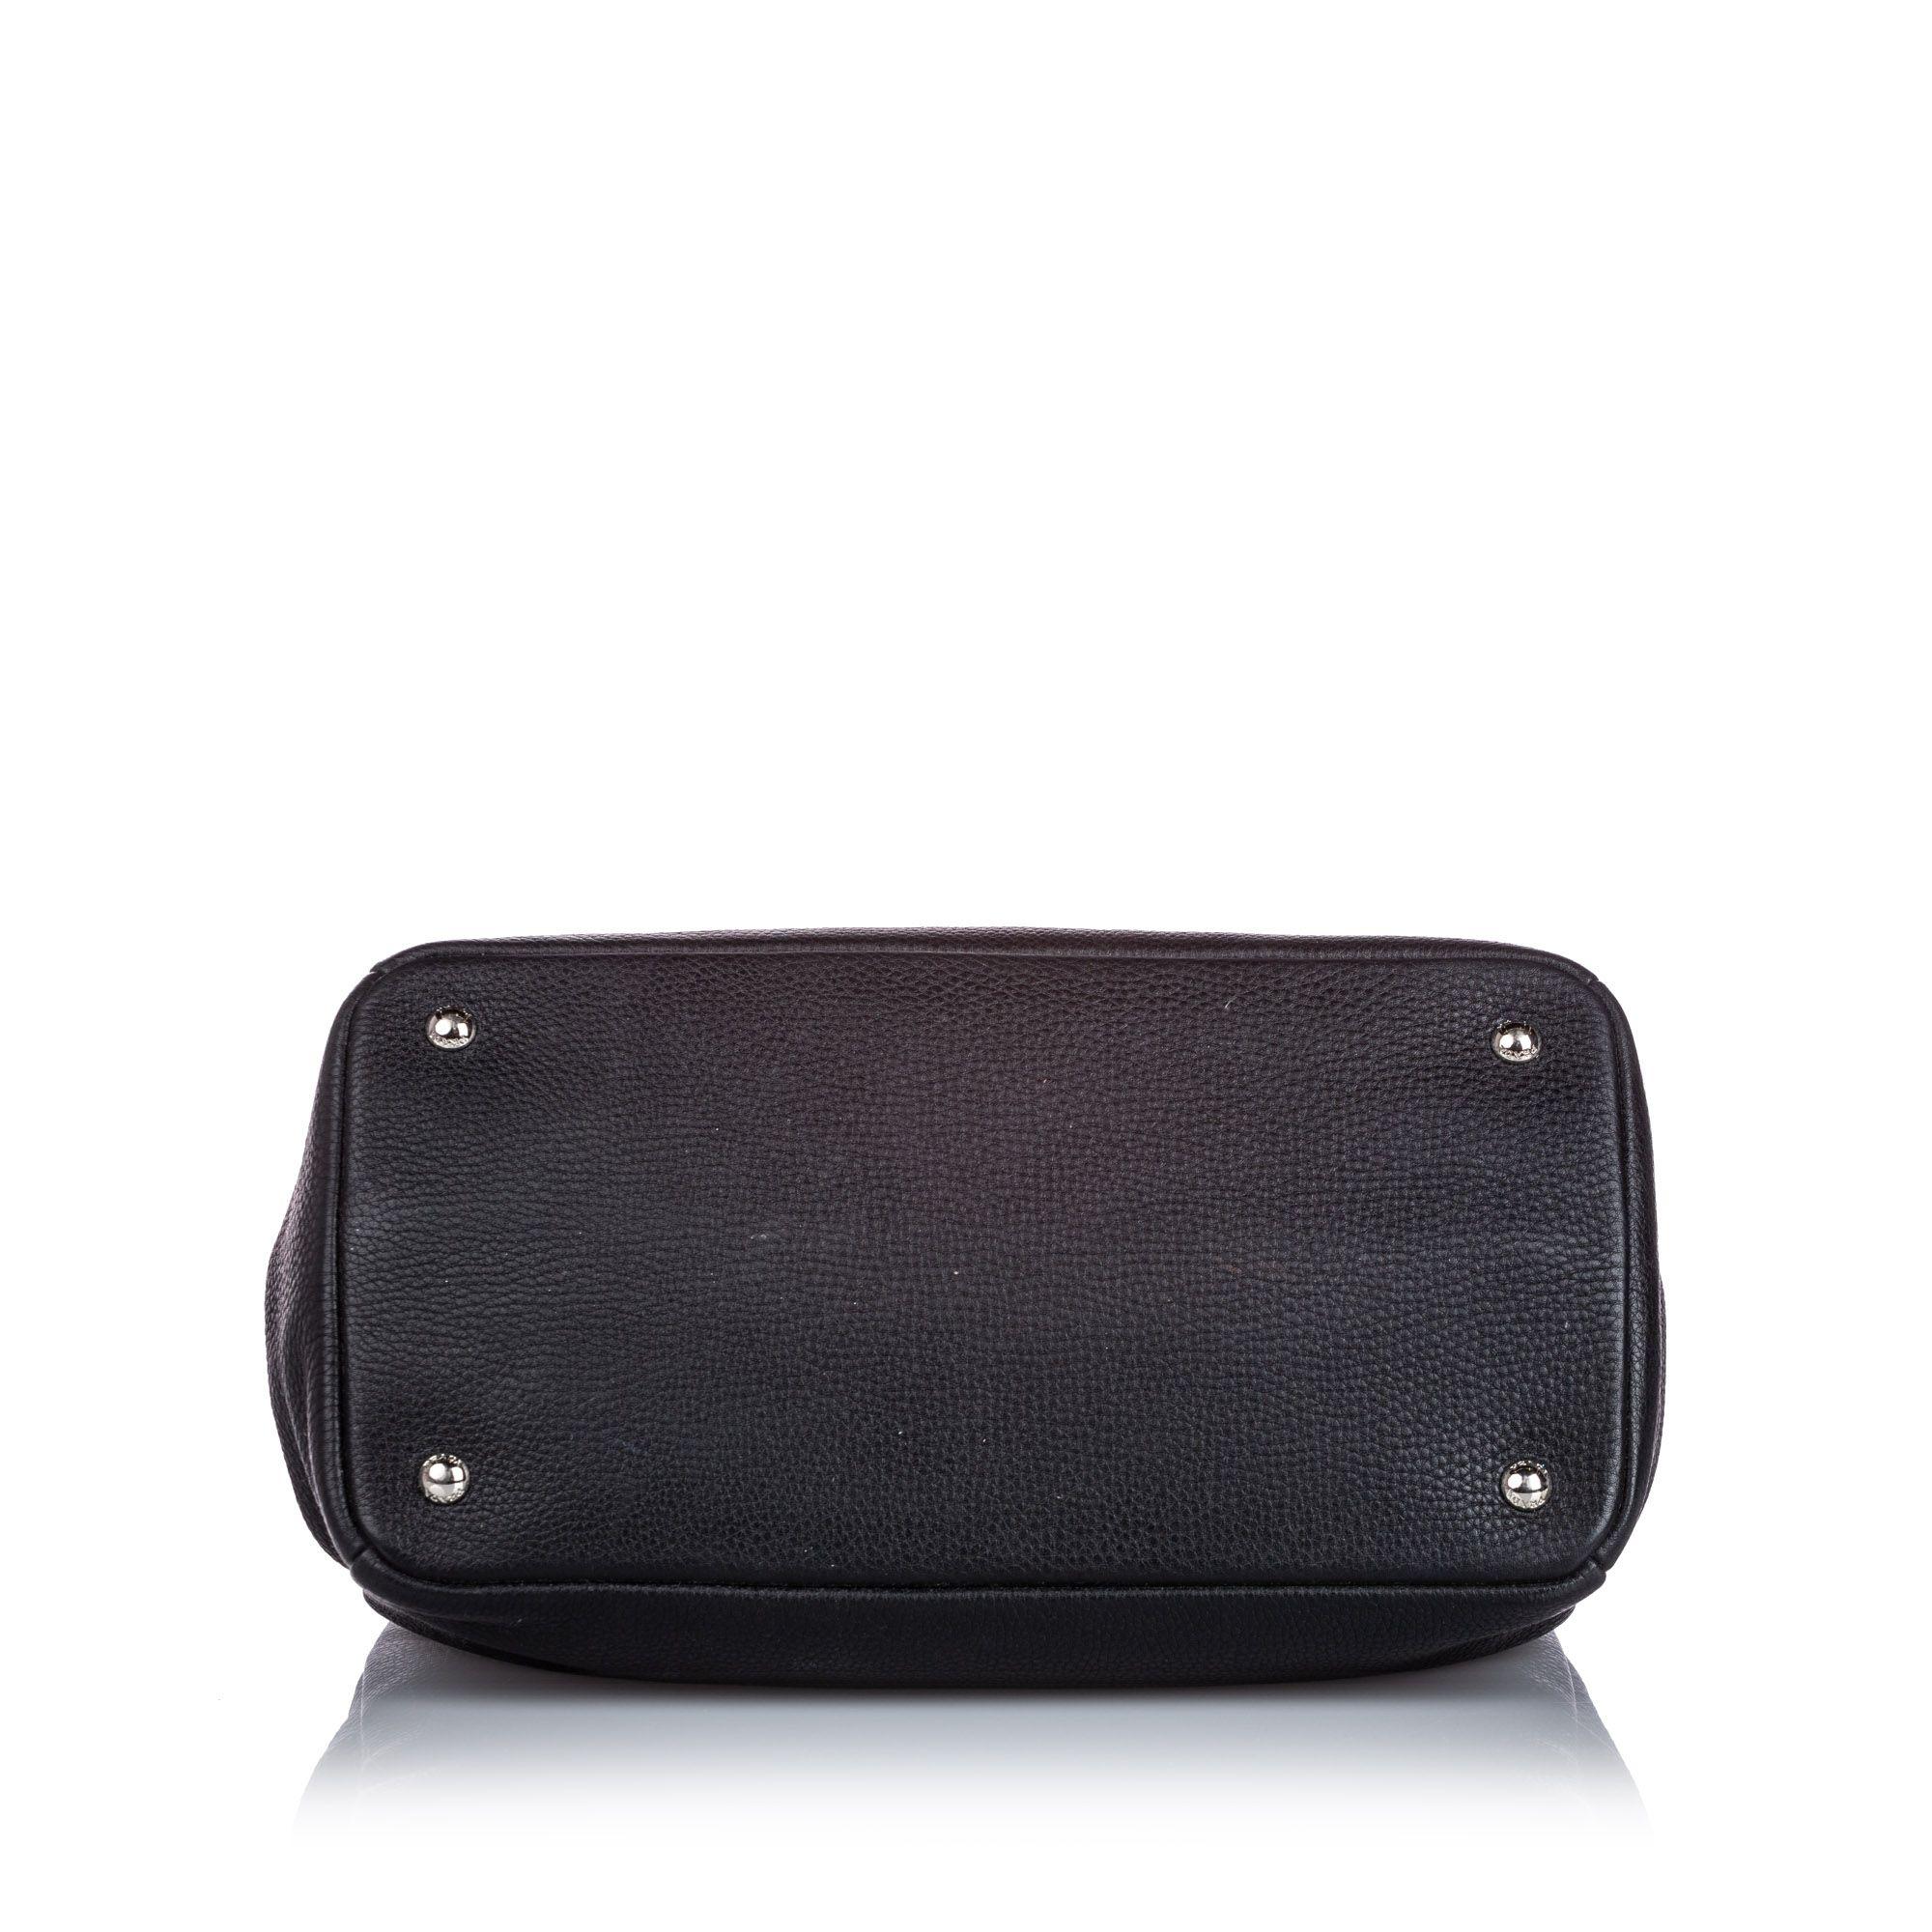 Vintage Prada Vitello Daino Leather Satchel Black